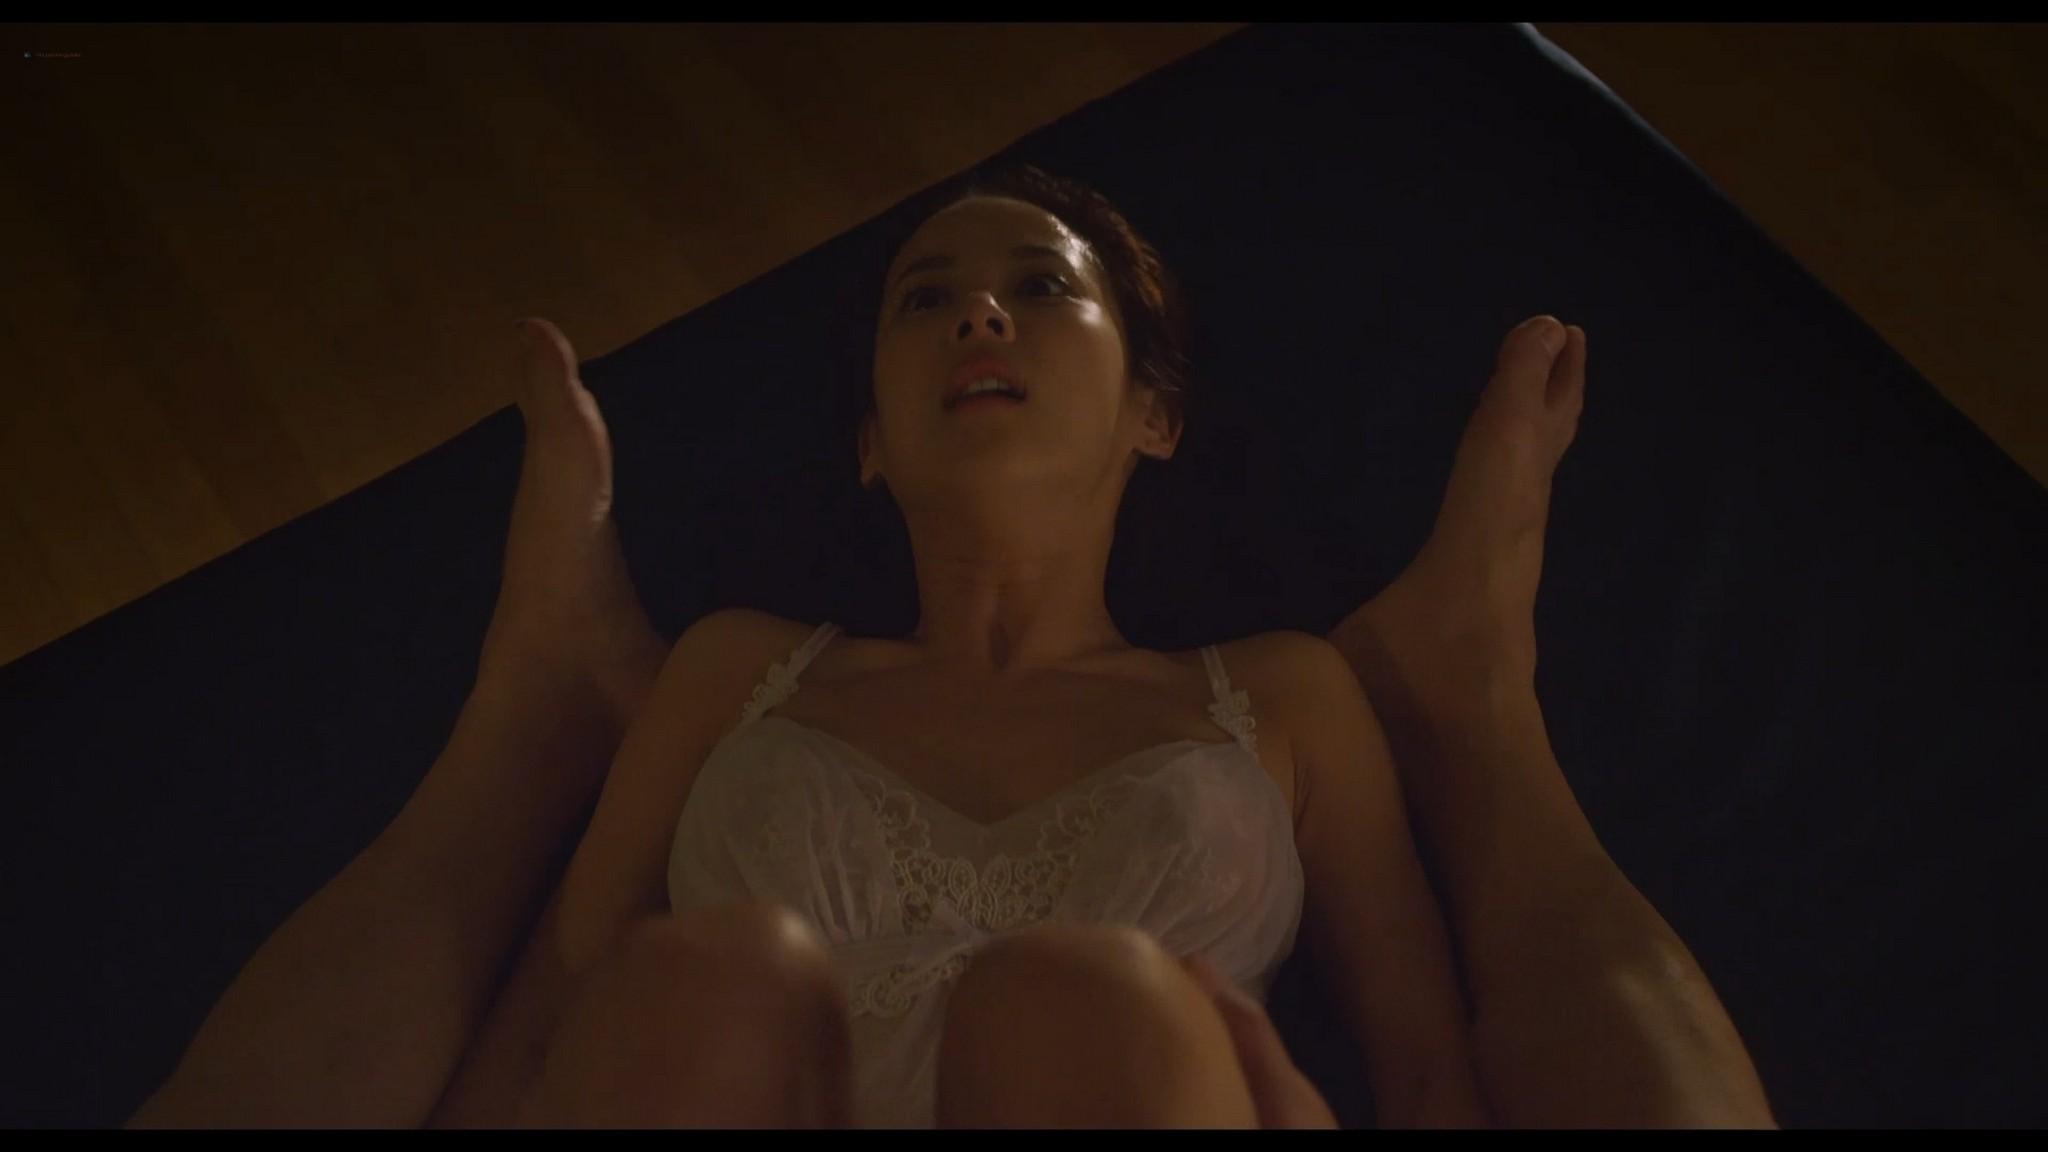 Yeo jeong Cho nude Clara Lee sexy Casa Amor Exclusive for Ladies 2015 1080p BluRay 7